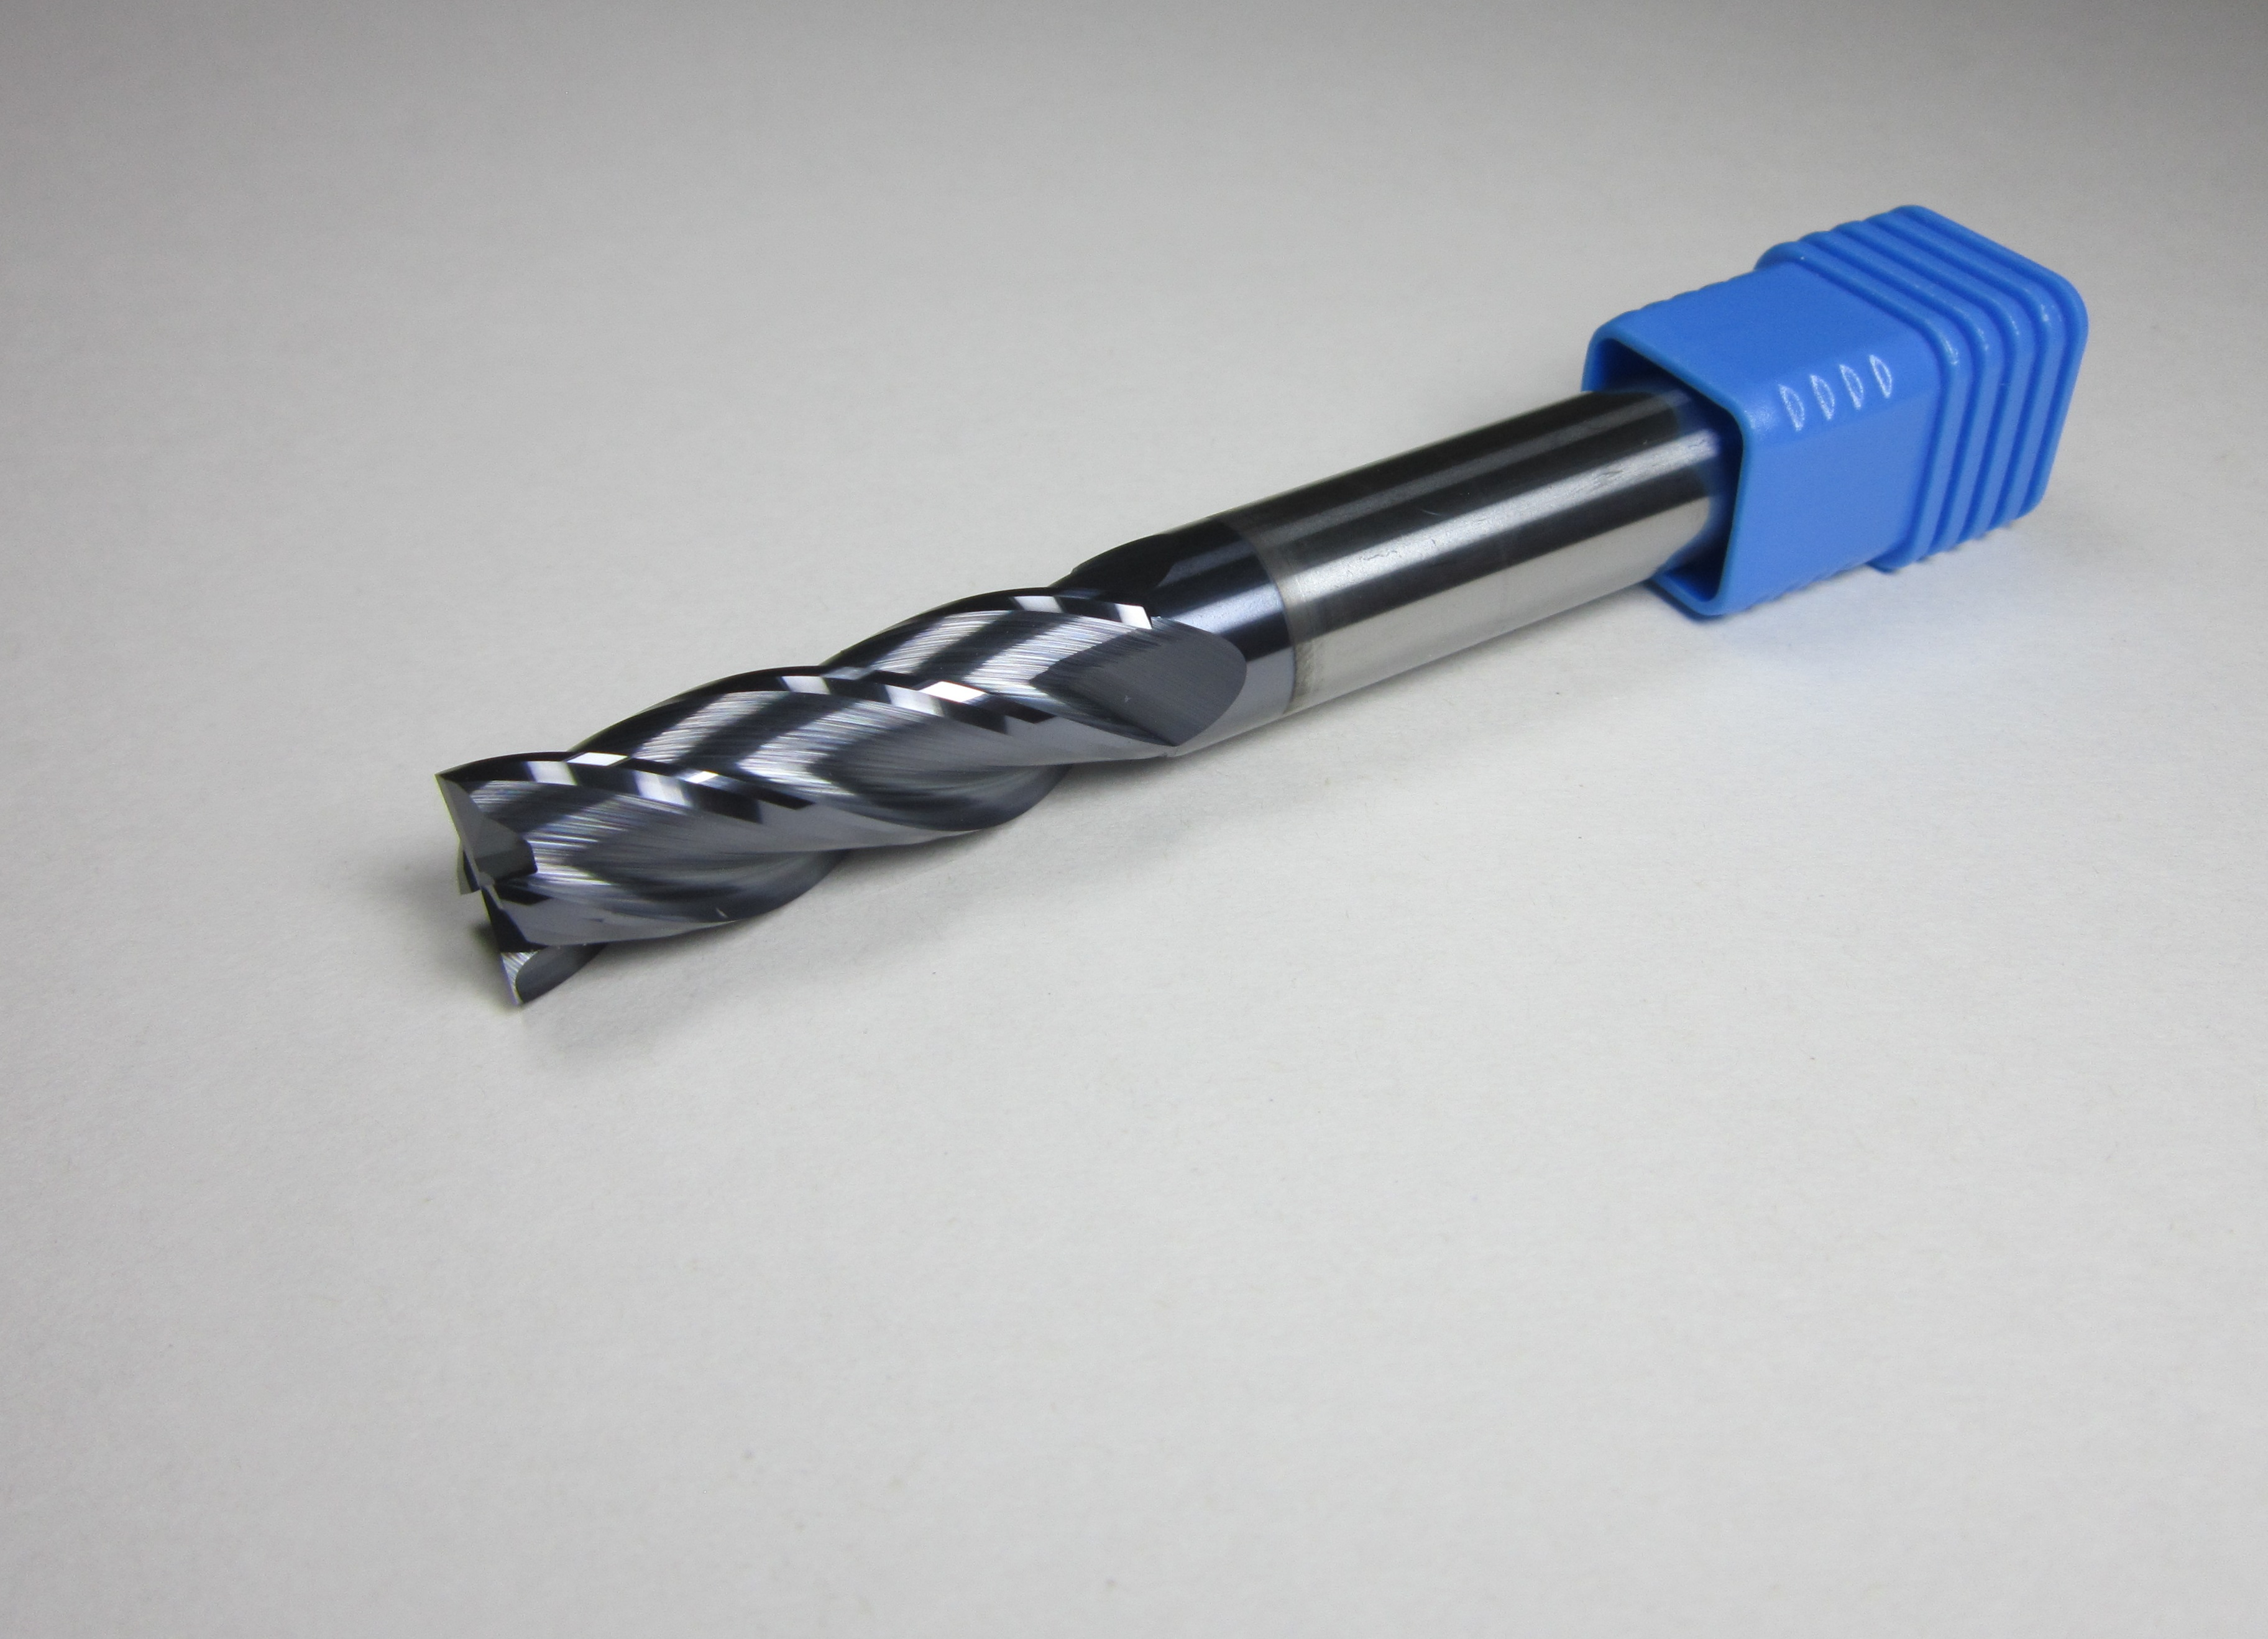 1pcs Flute Tungsten Carbide Flat Alloy End Mill Cutter 6mm HRC45 Milling Tool